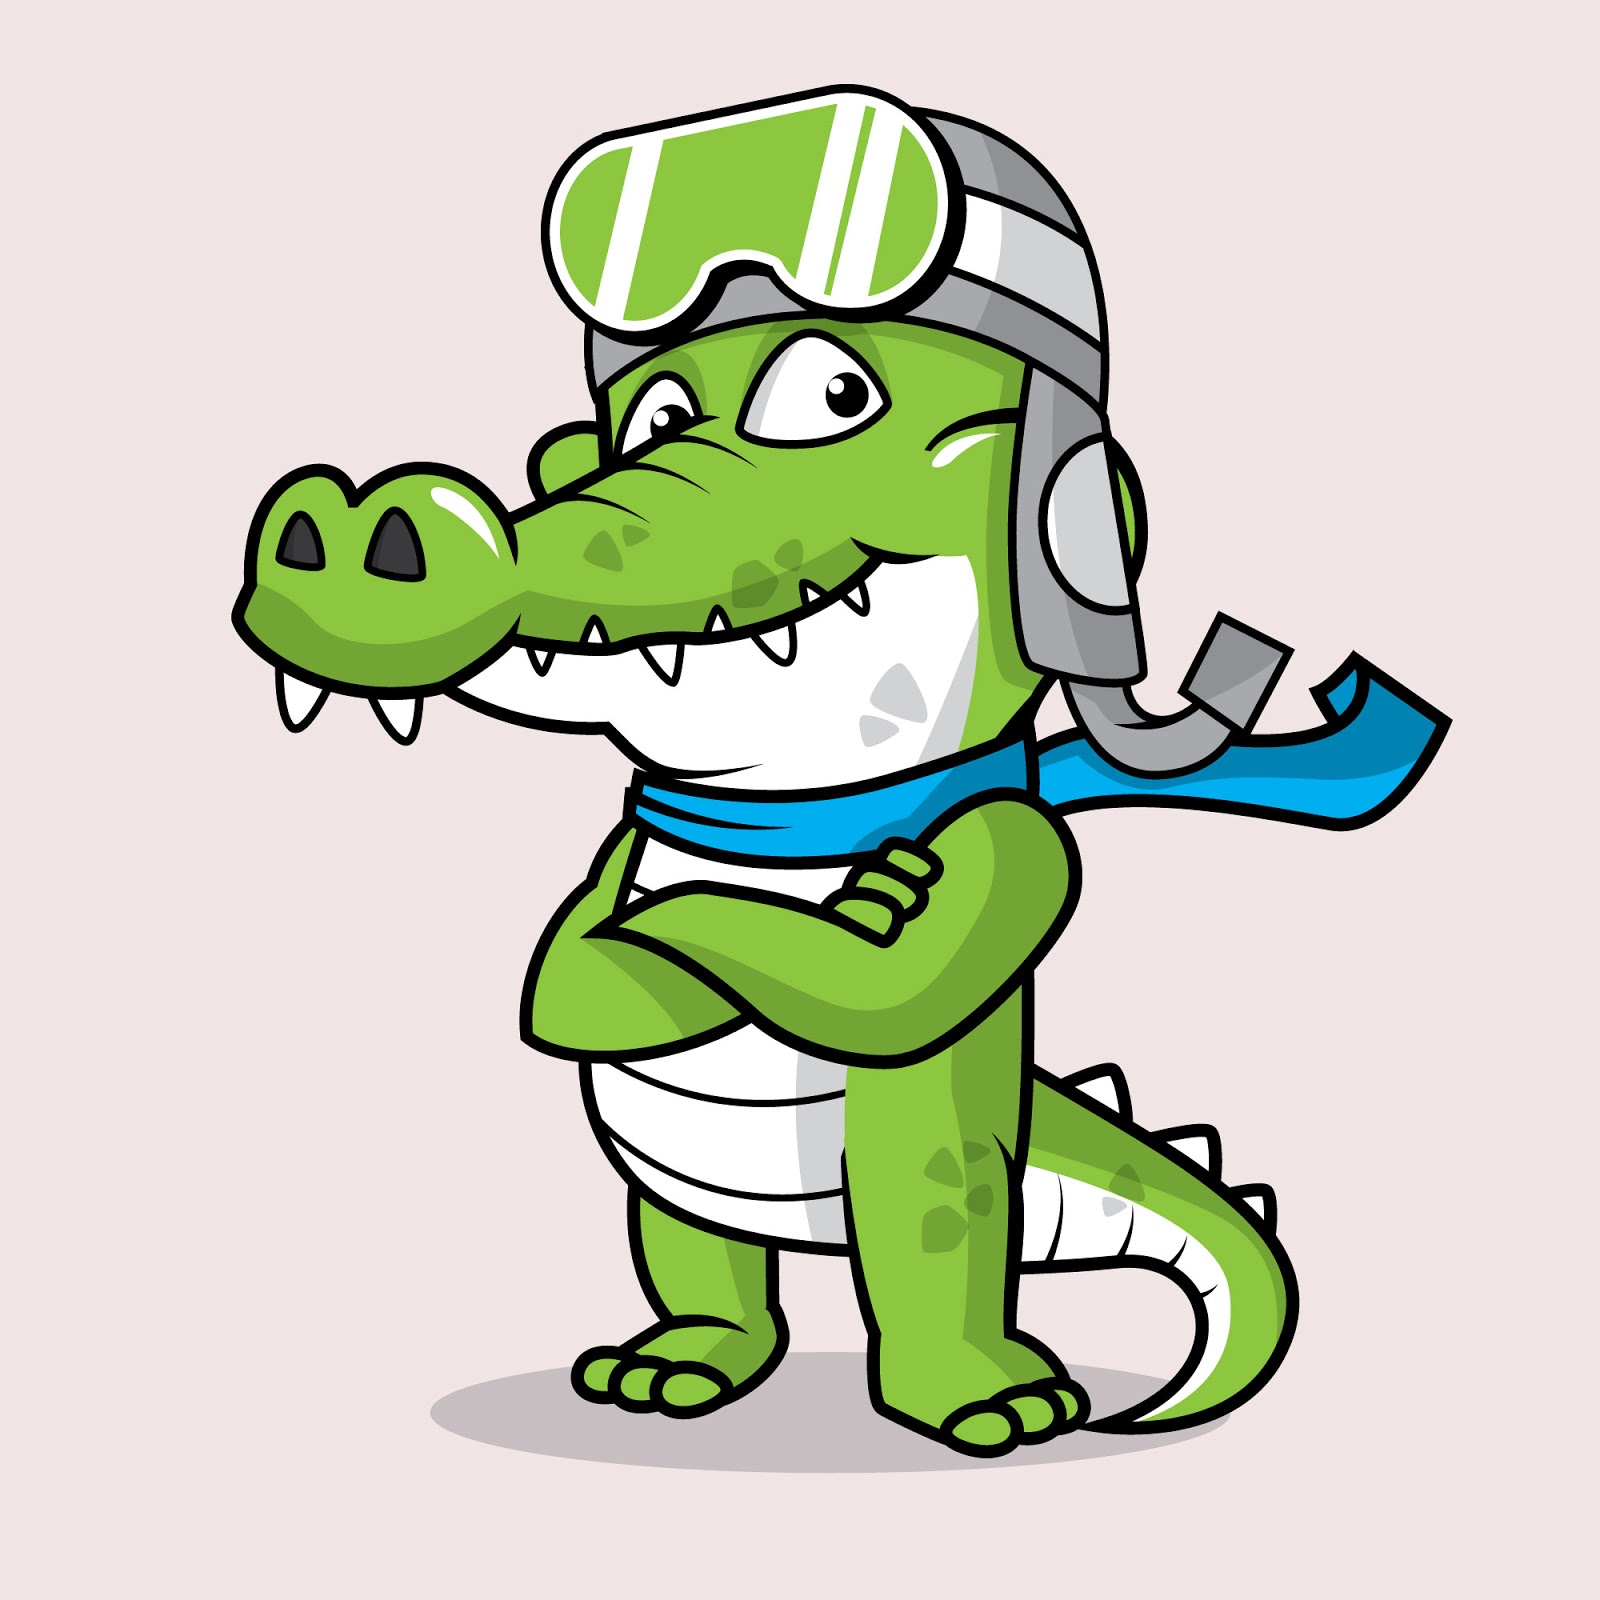 Crocodile Mascot Logo Free Download Vector CDR, AI, EPS and PNG Formats